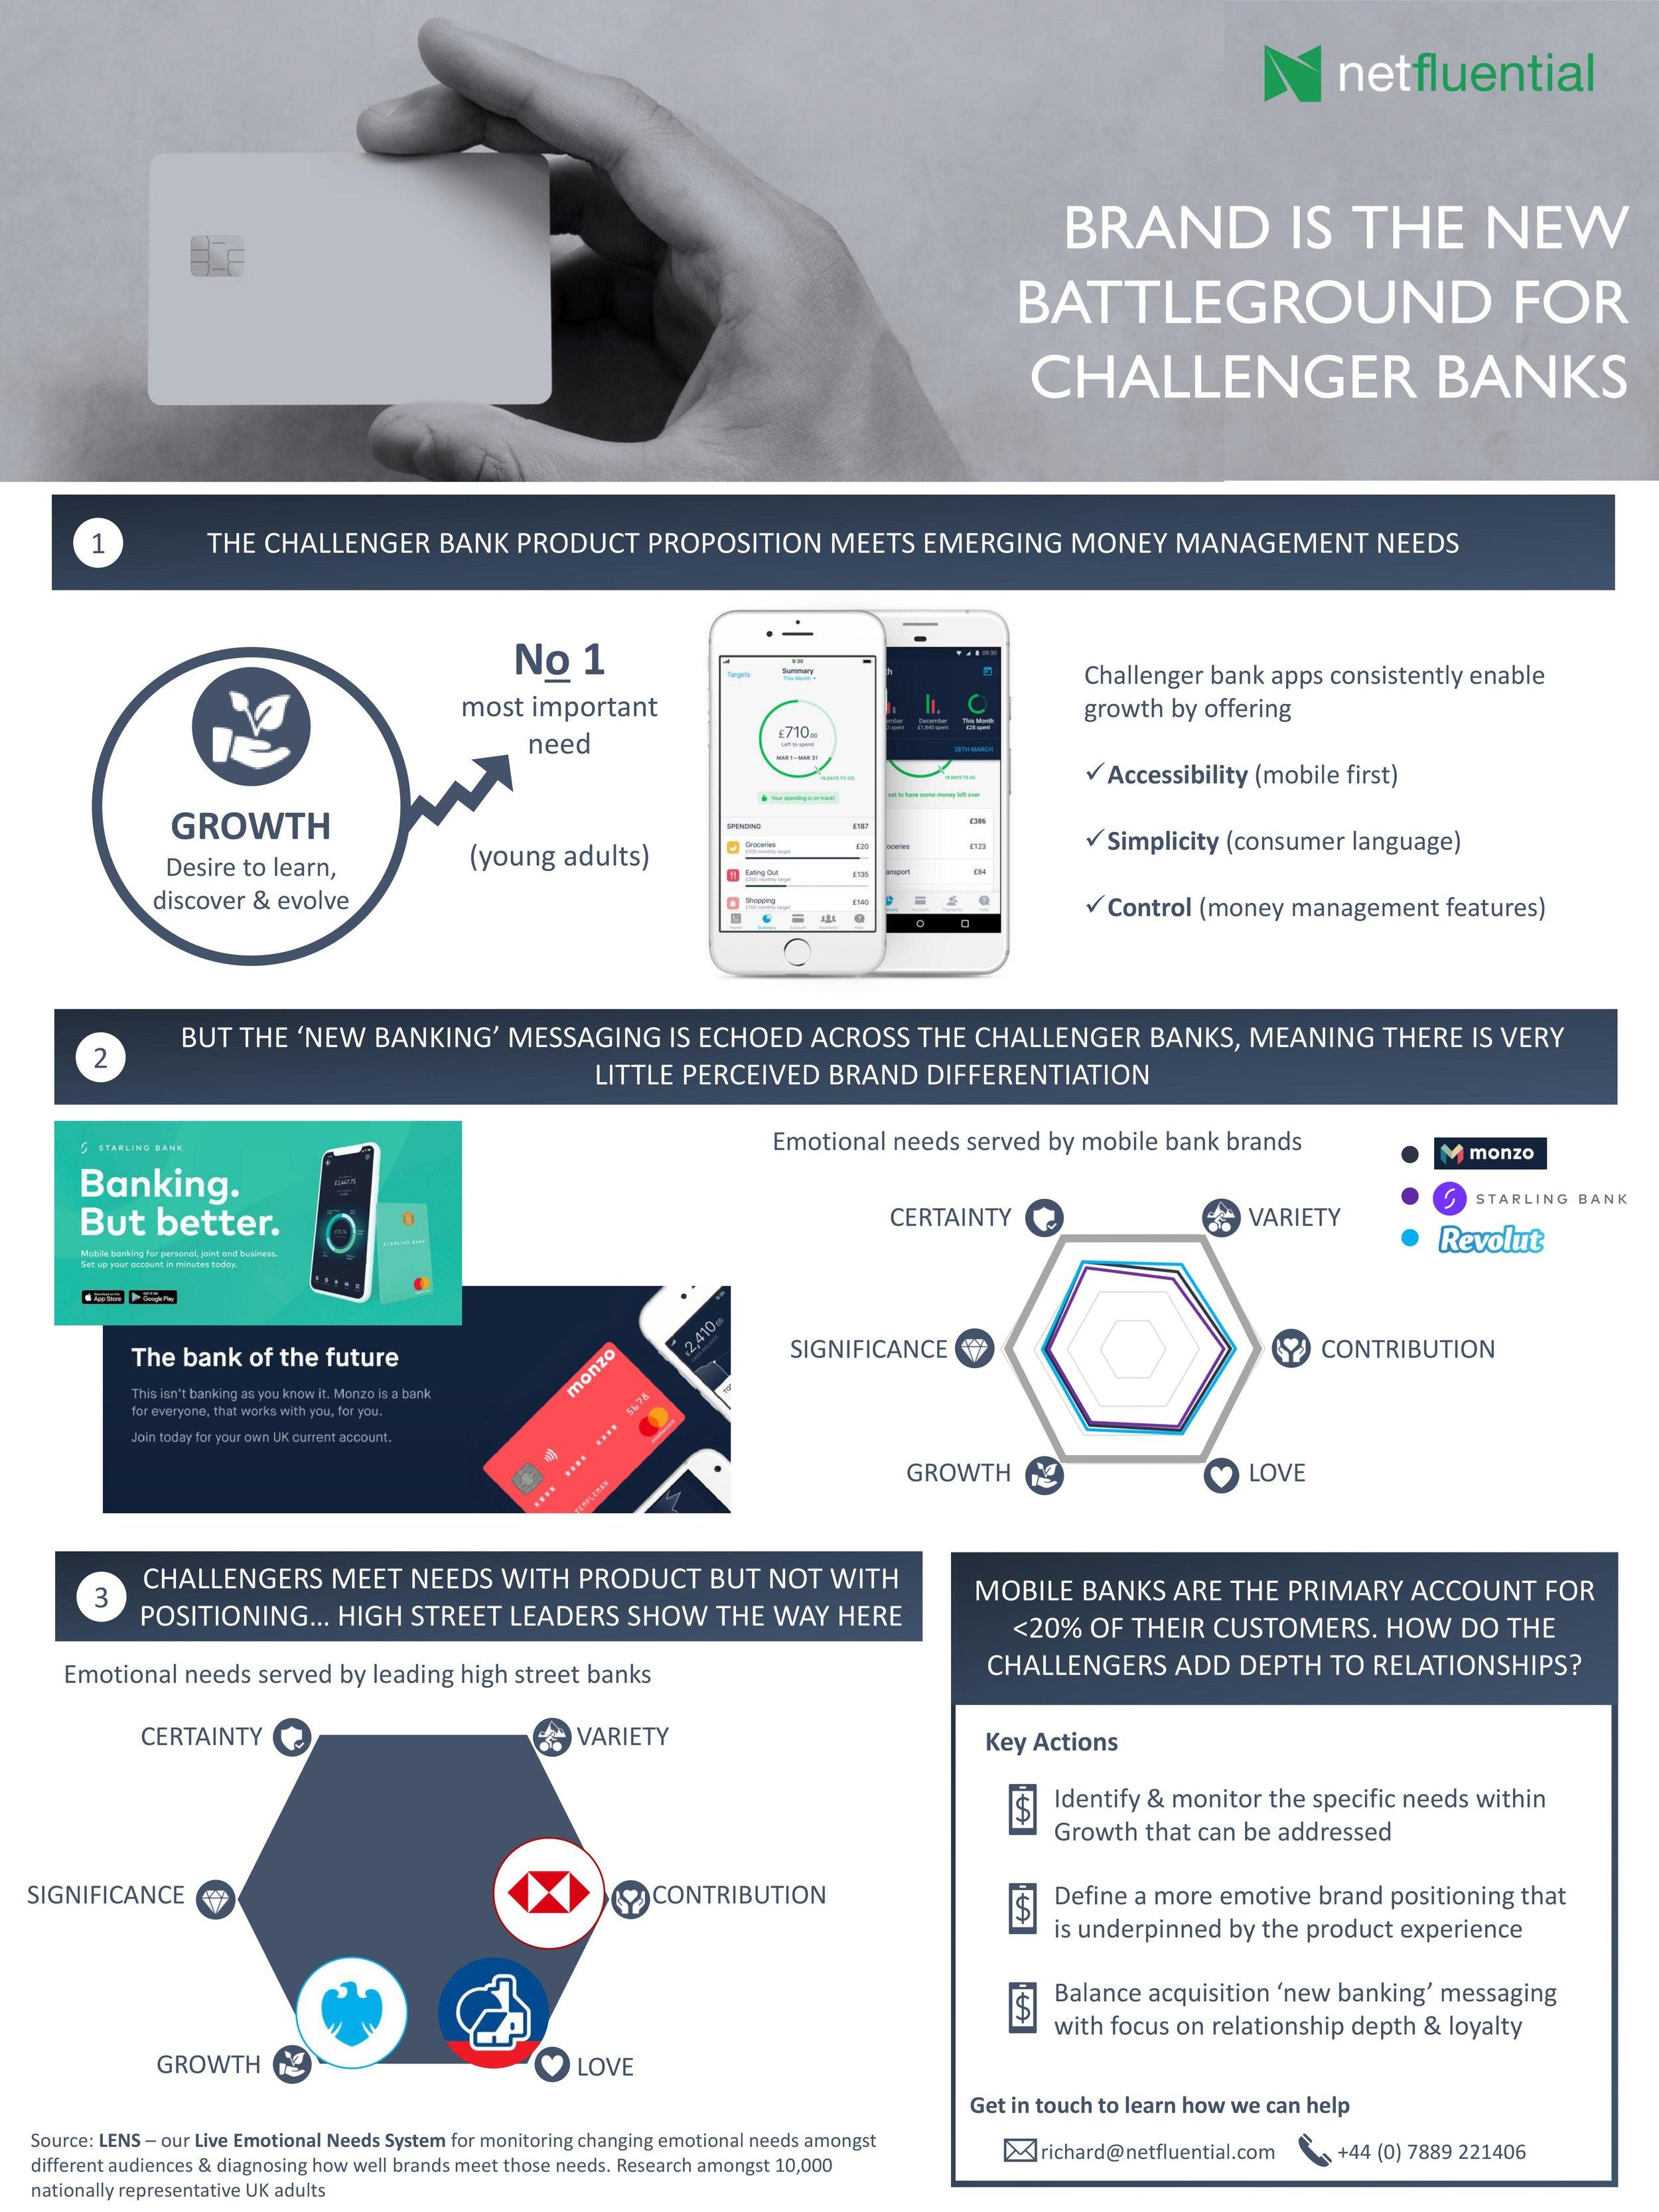 Brand is New Battleground for Challenger Banks.jpg